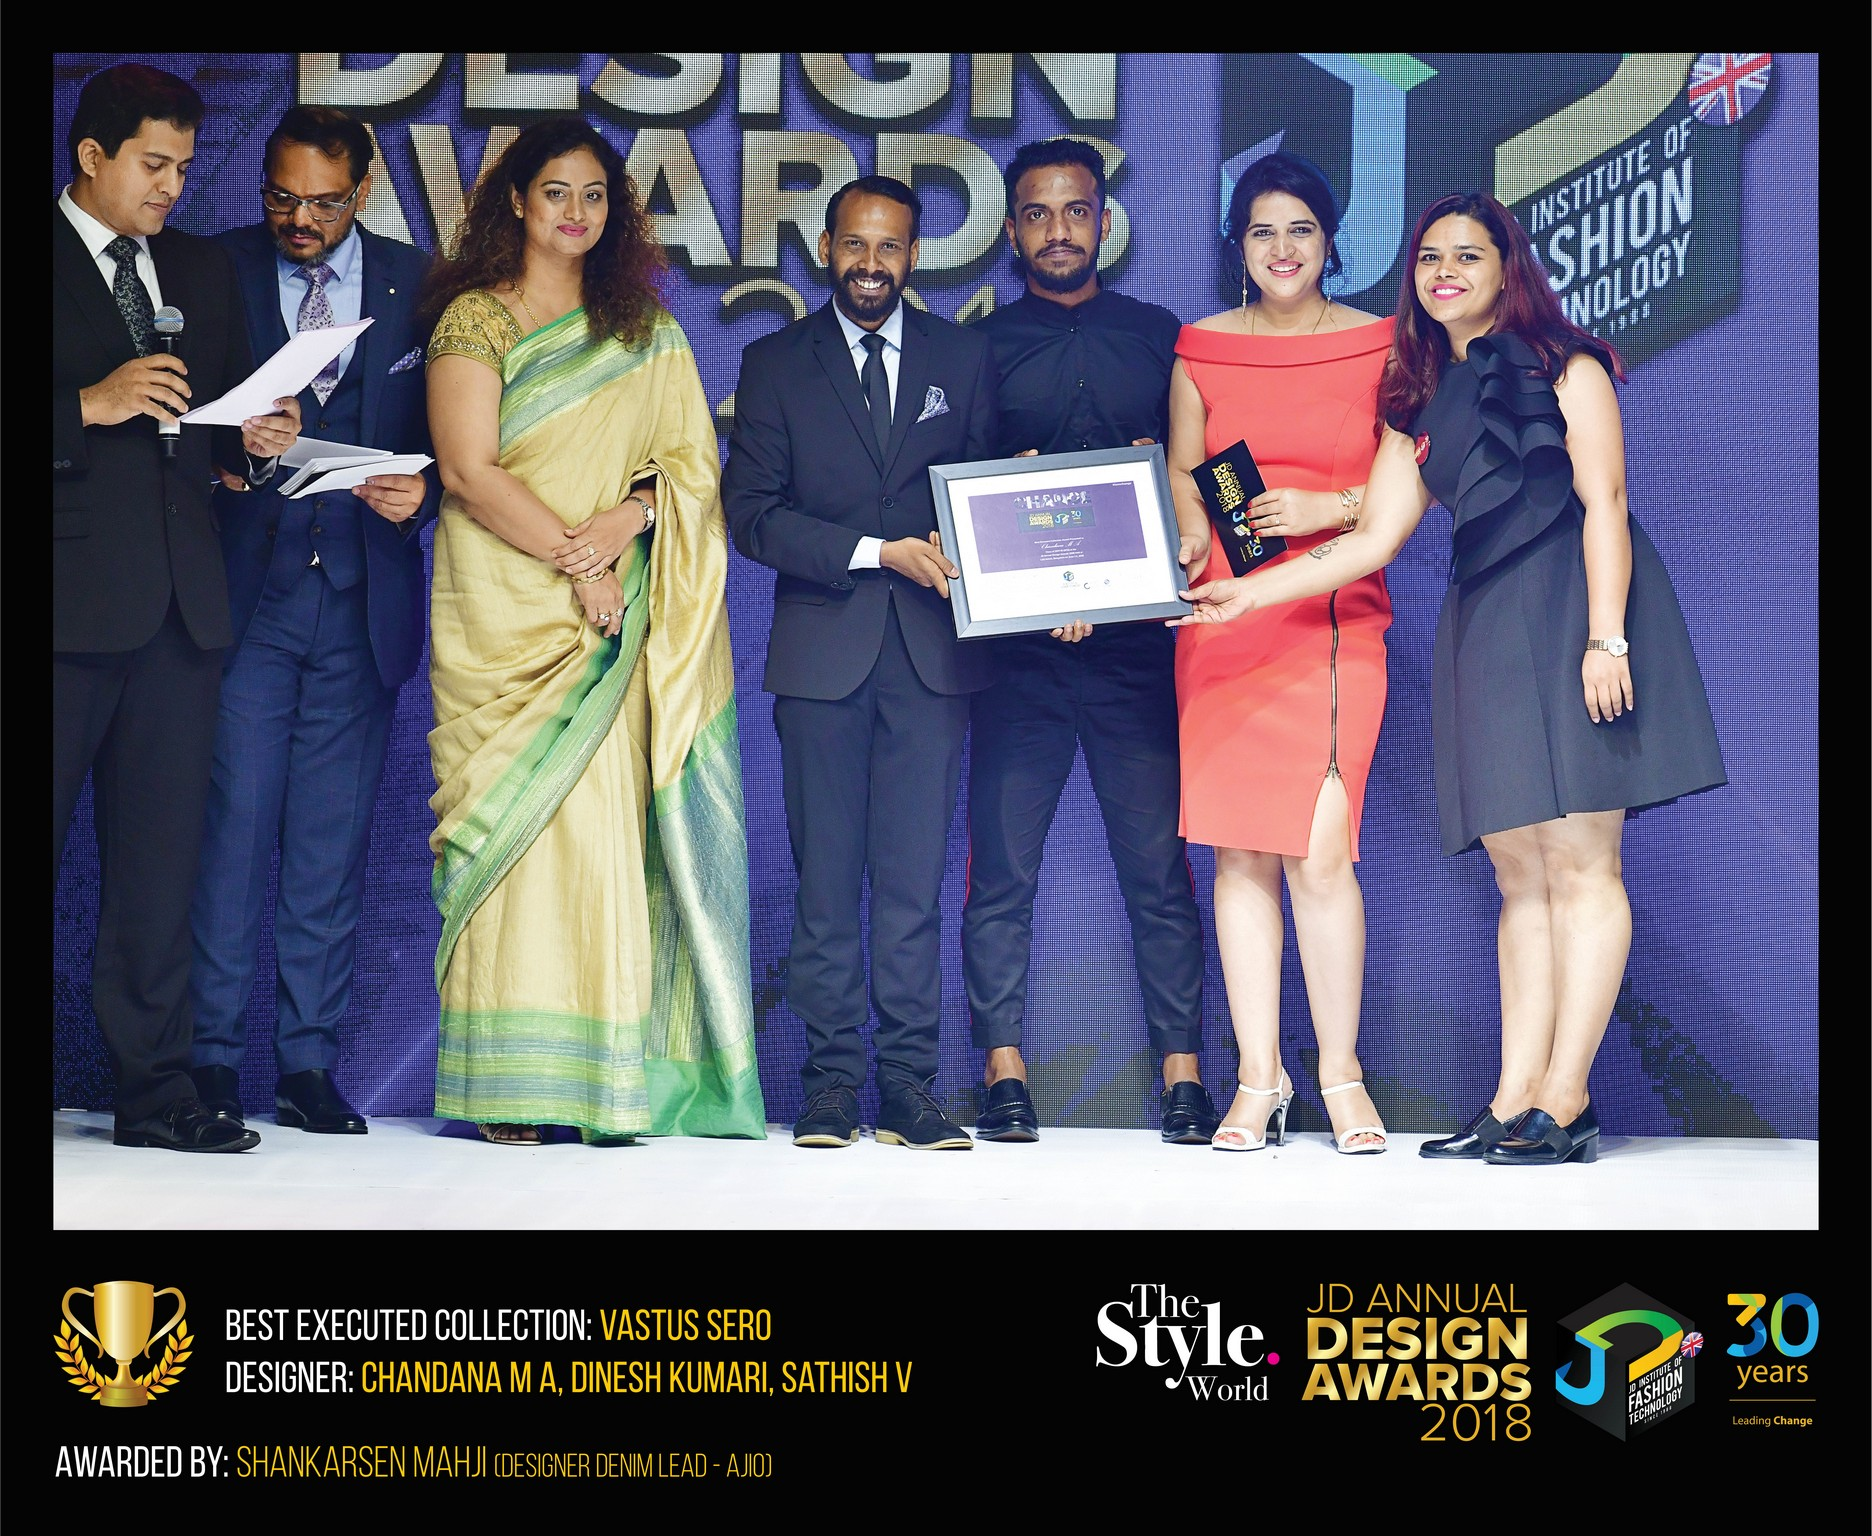 Vastus Sero – Change – JD Annual Design Awards 2018   Designer: Chandana, Dinesh and Sathish   Photography : Jerin Nath (@jerin_nath) vastus sero - VASTUS SERO - Vastus Sero – Change – JD Annual Design Awards 2018